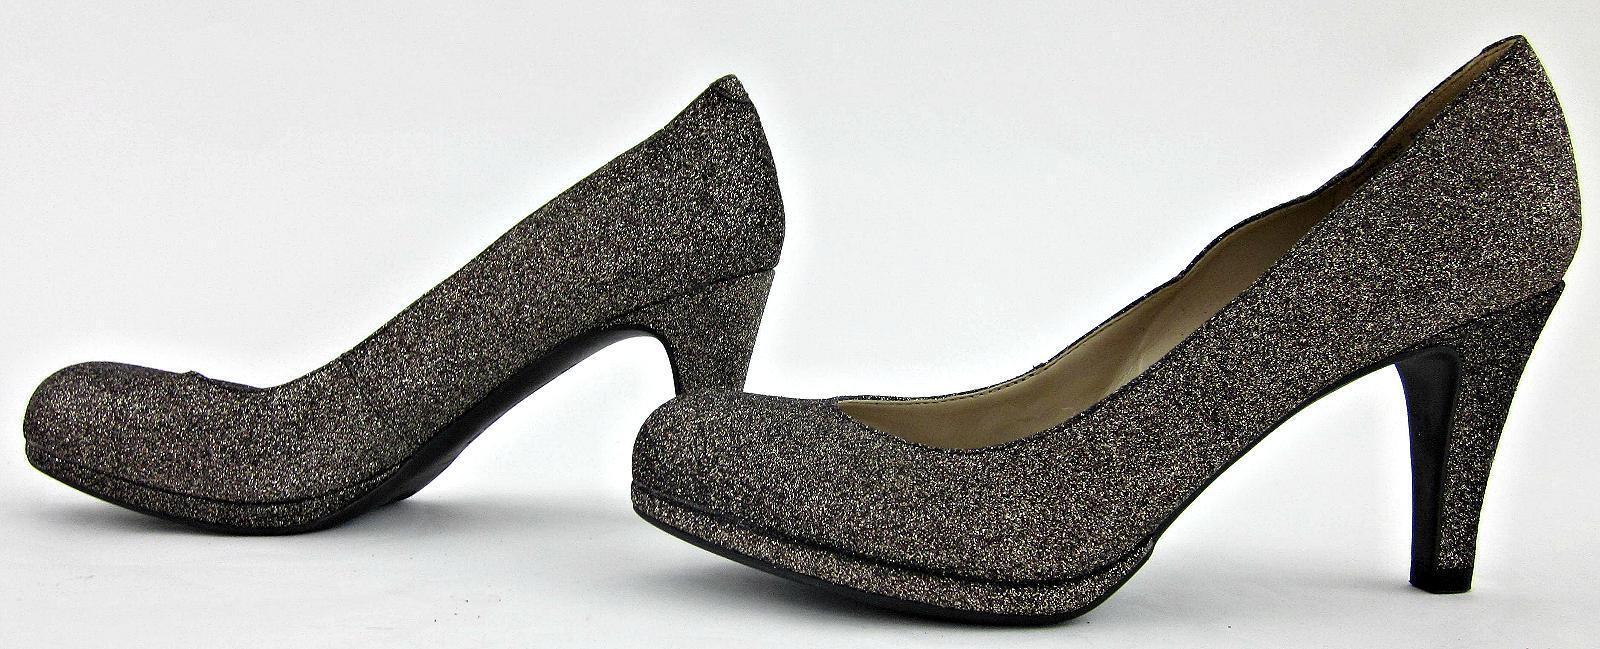 NEW  Naturalizer 'Lennox' Round Toe Dress 6B Pumps Platinum Glitter Leather 6B Dress 8b57cf